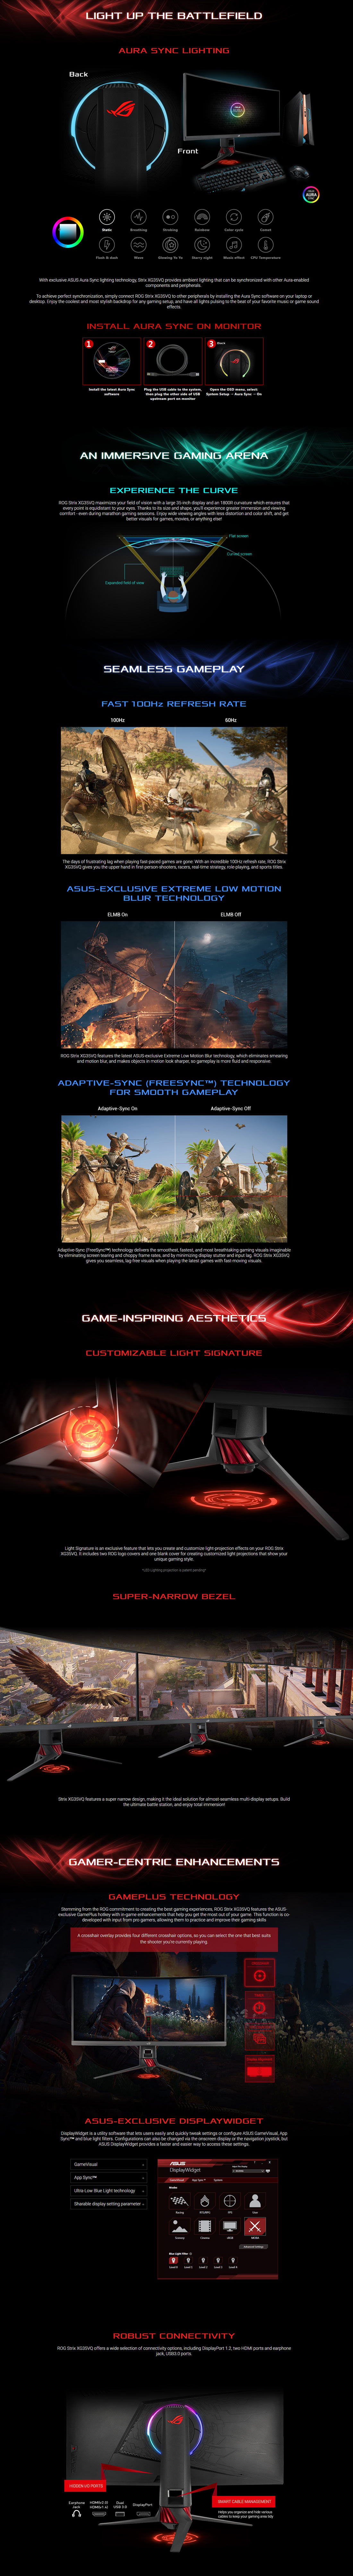 Asus Strix GamePLUS TUV XG35VQ